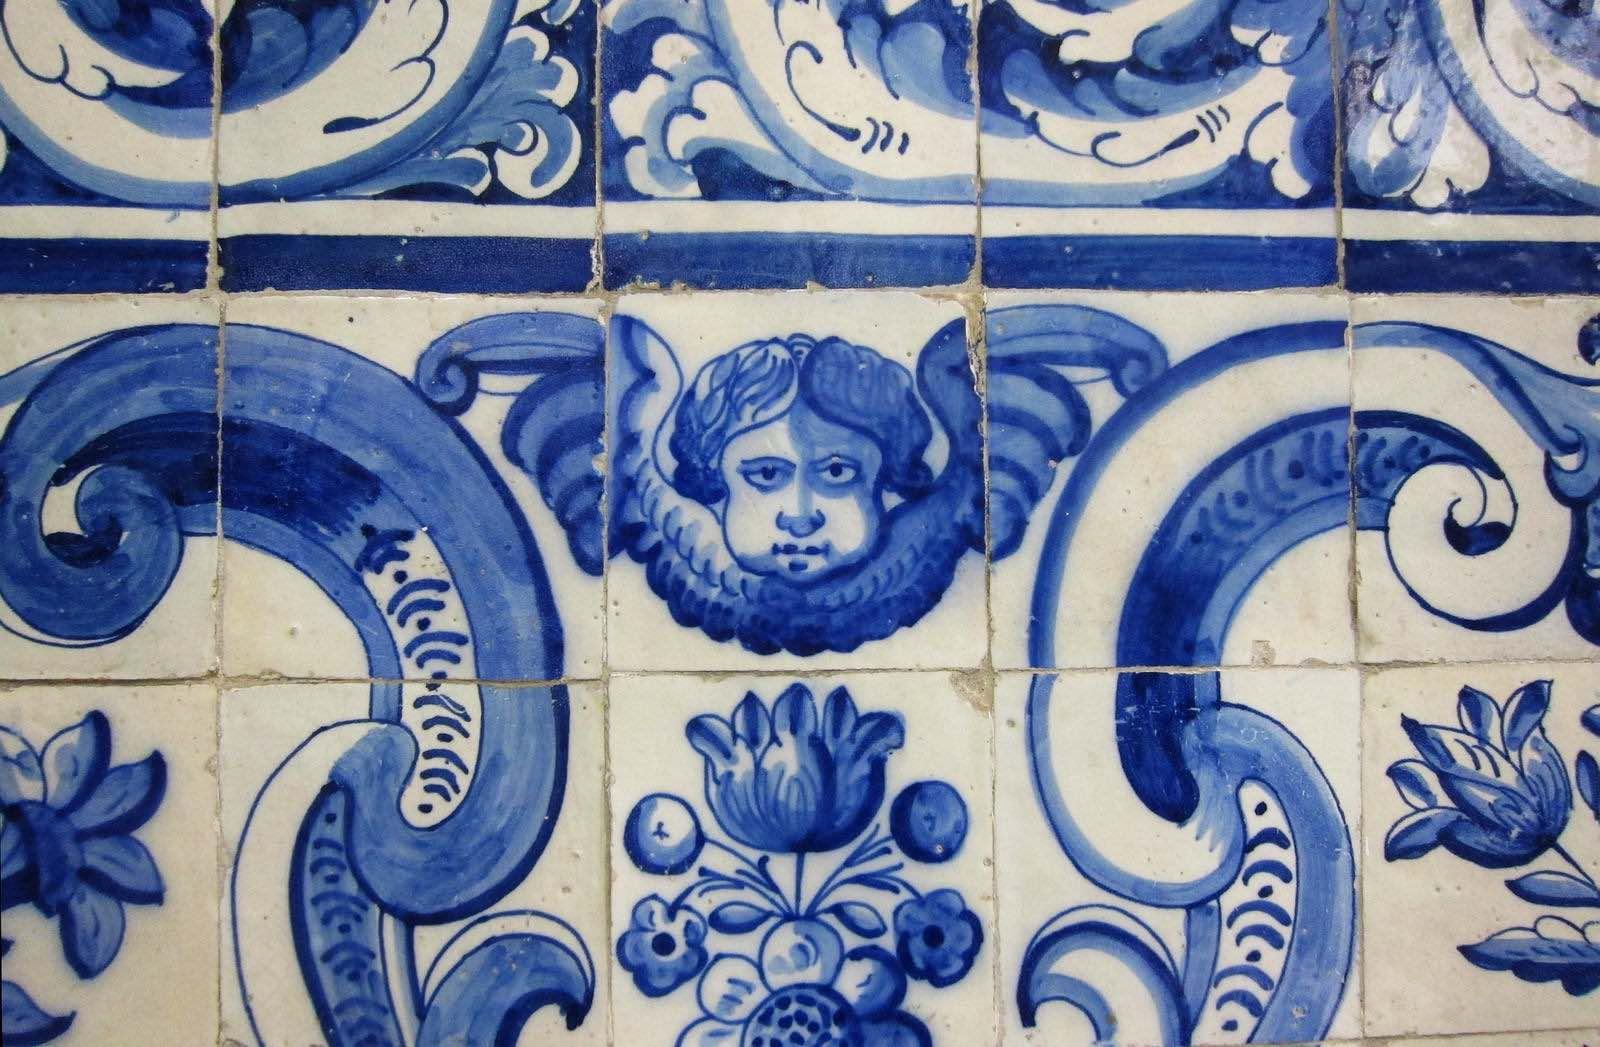 Lisboa secreta a infinita riqueza de azulejos for Azulejos historia